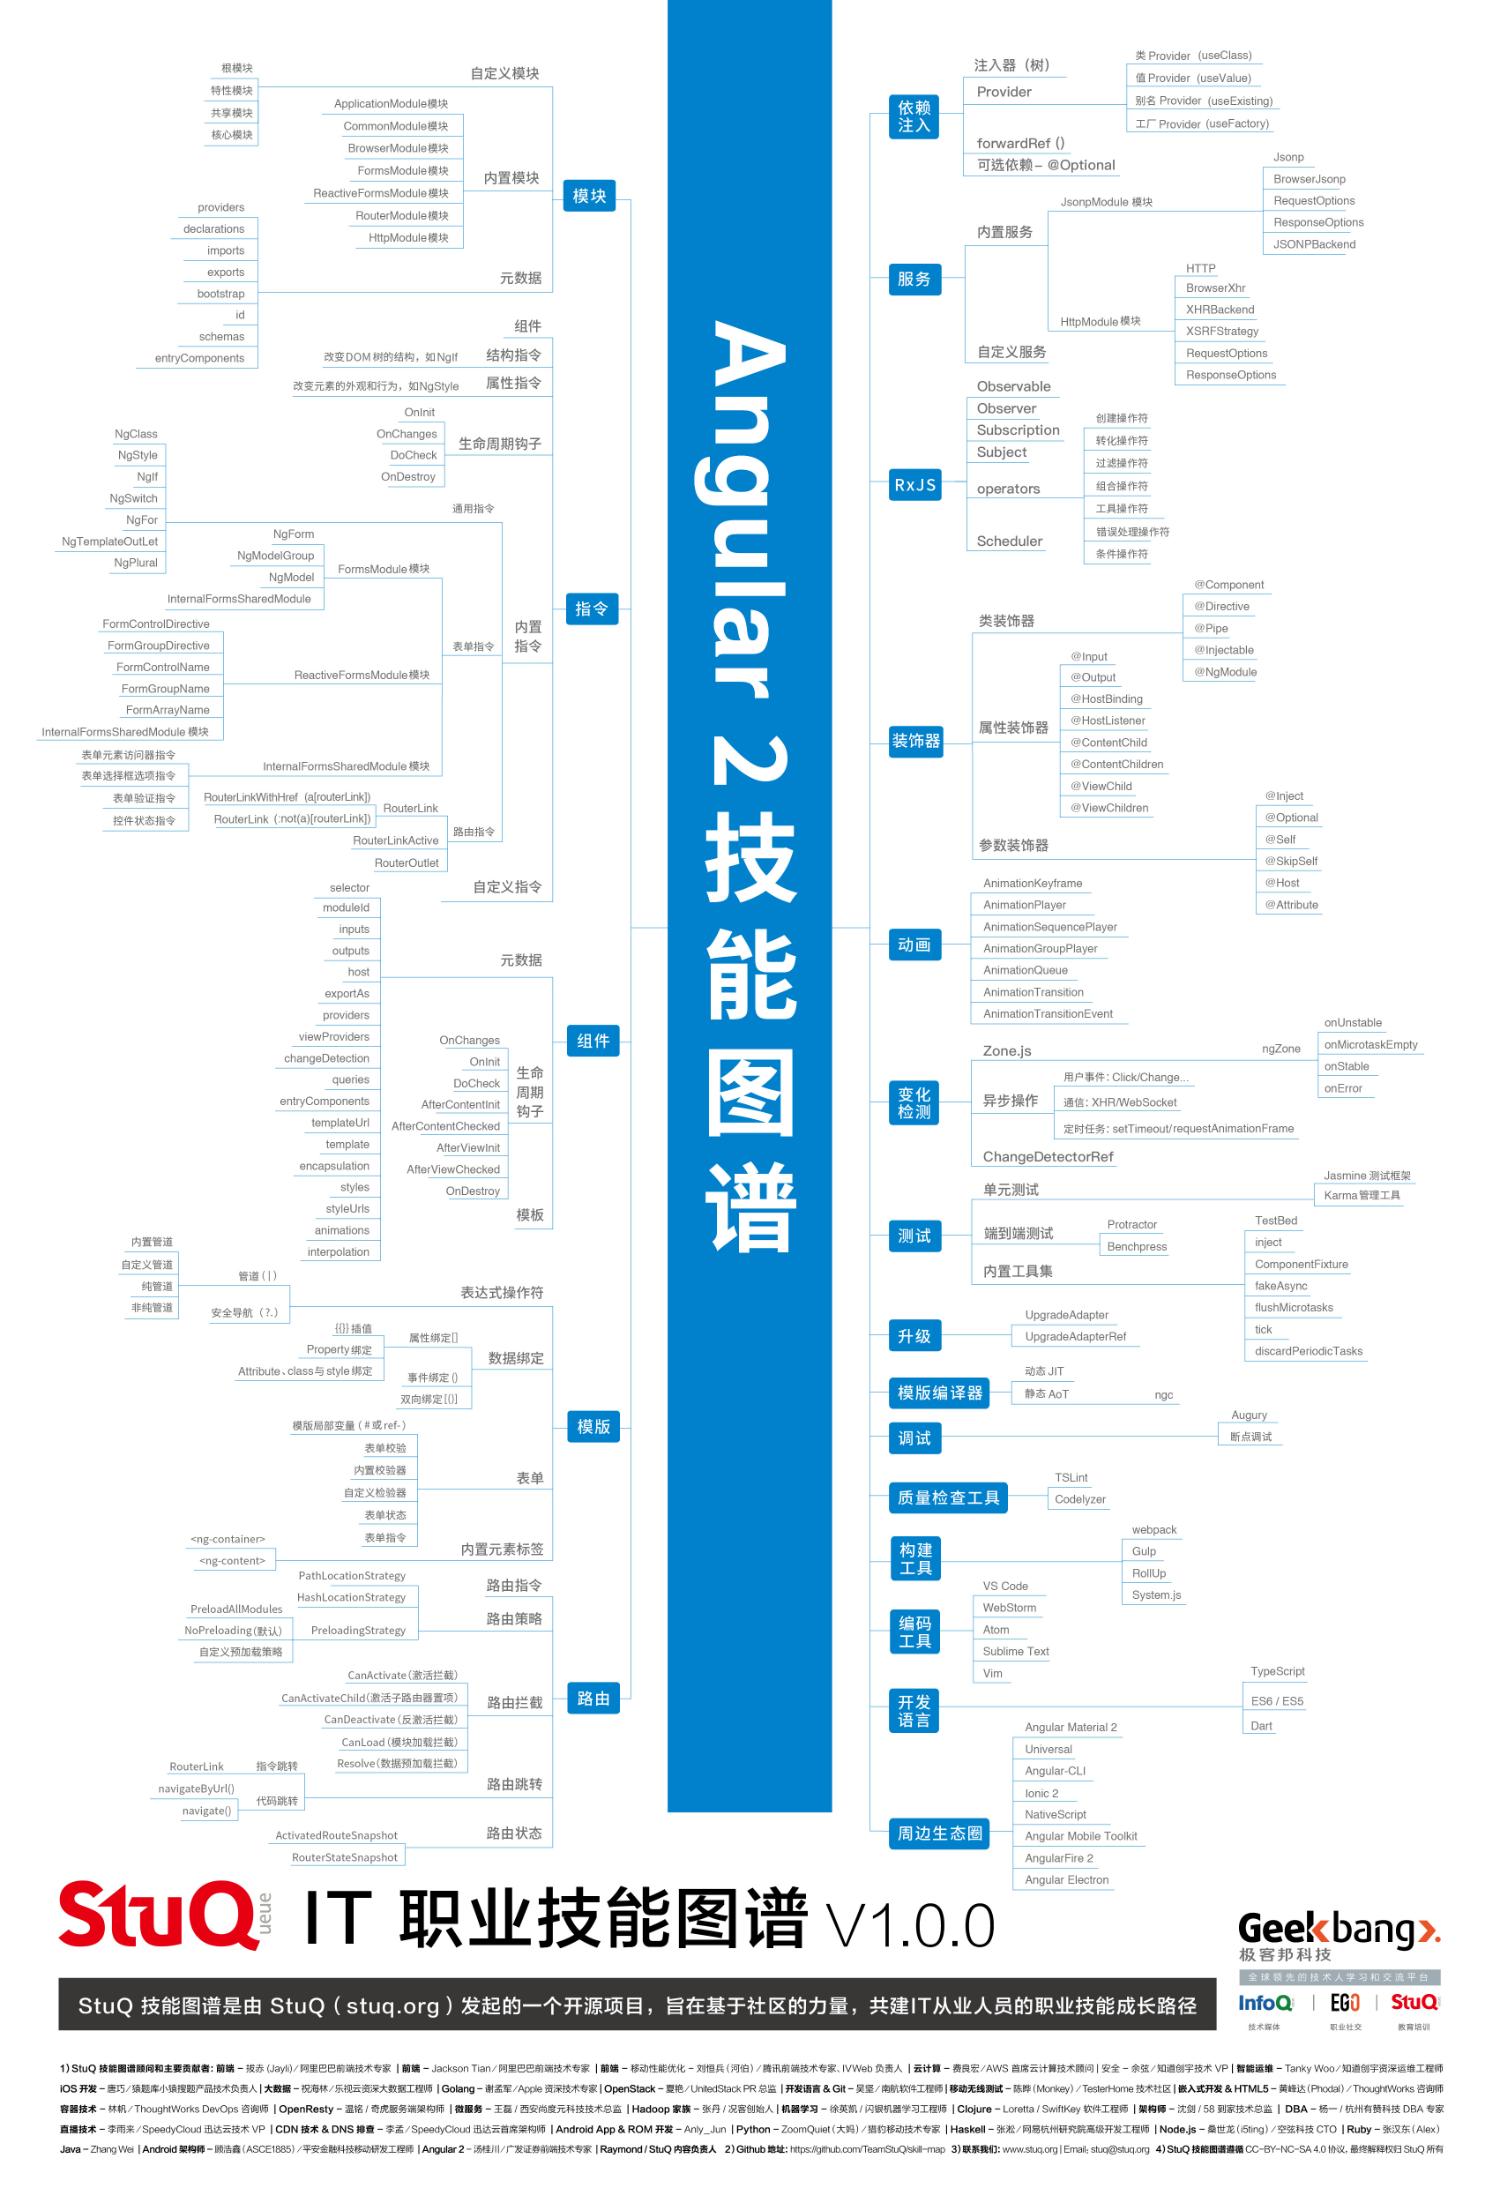 20181220_程序员技能图谱-Angular2-by-StuQ.png